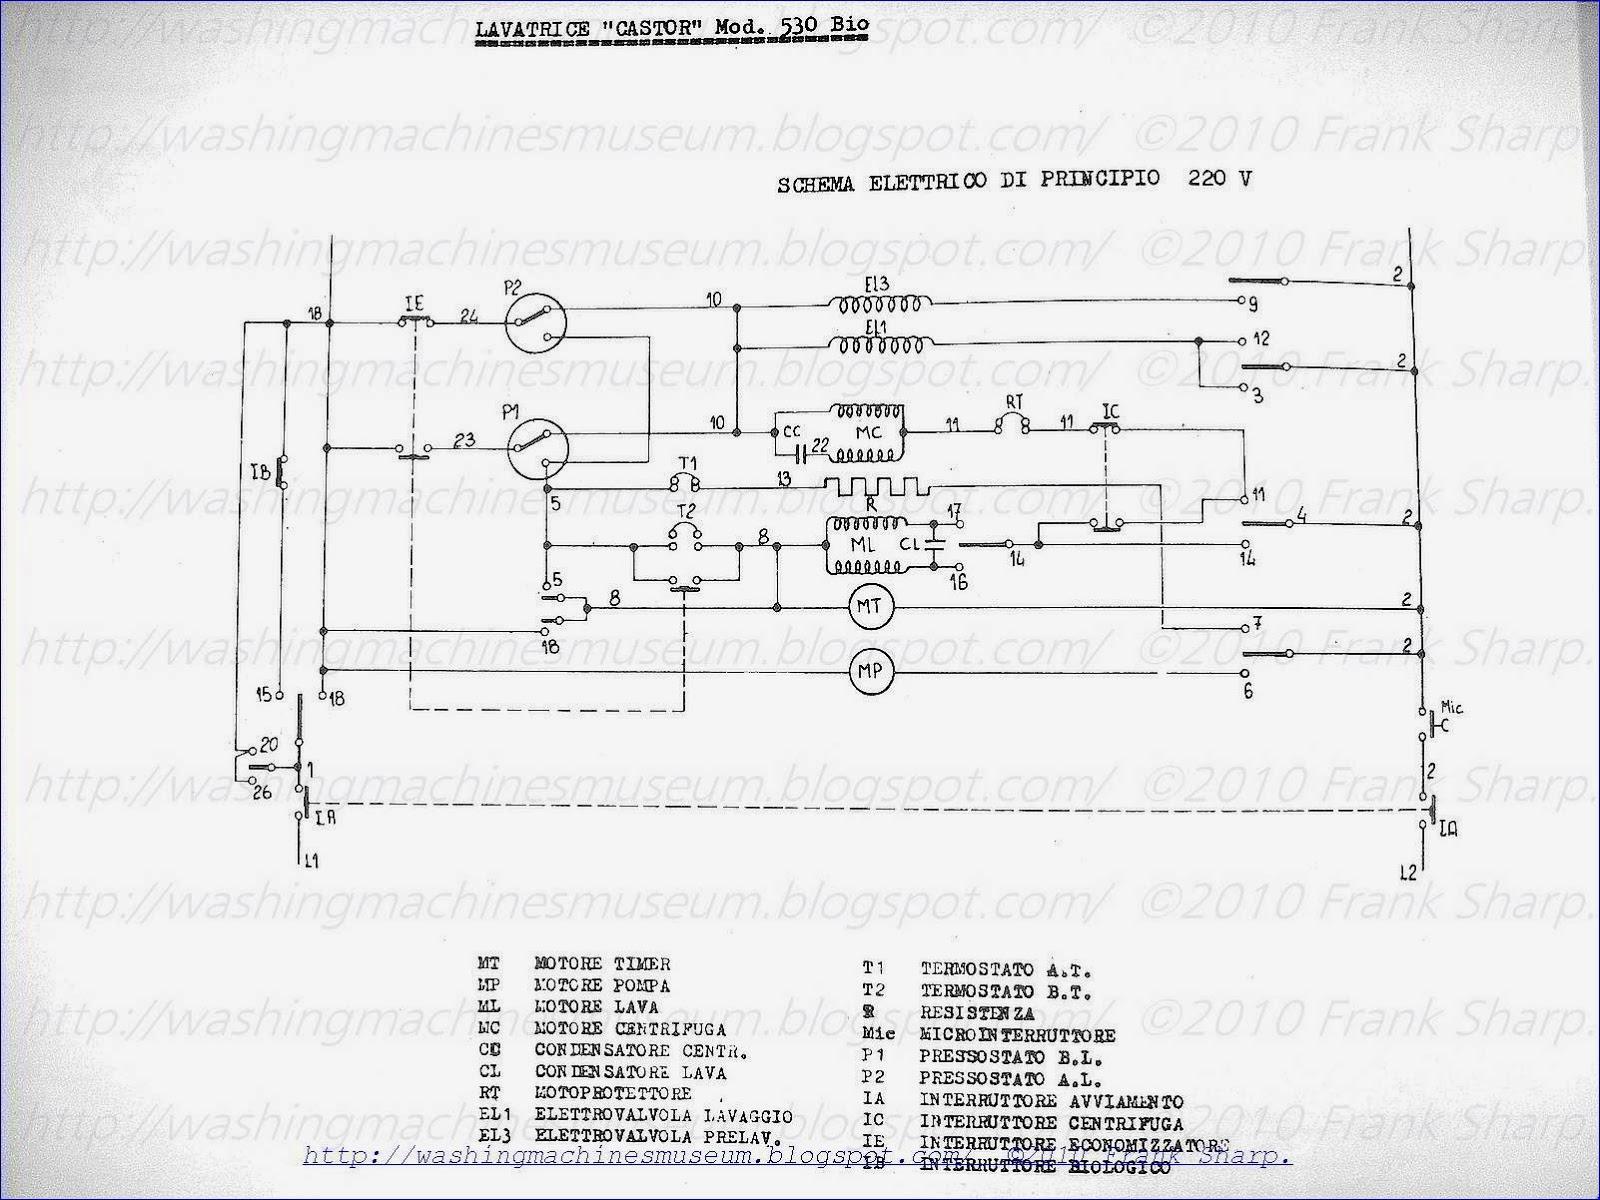 washer rama museum   castor mod  530  u0026quot bio u0026quot  schematic diagram